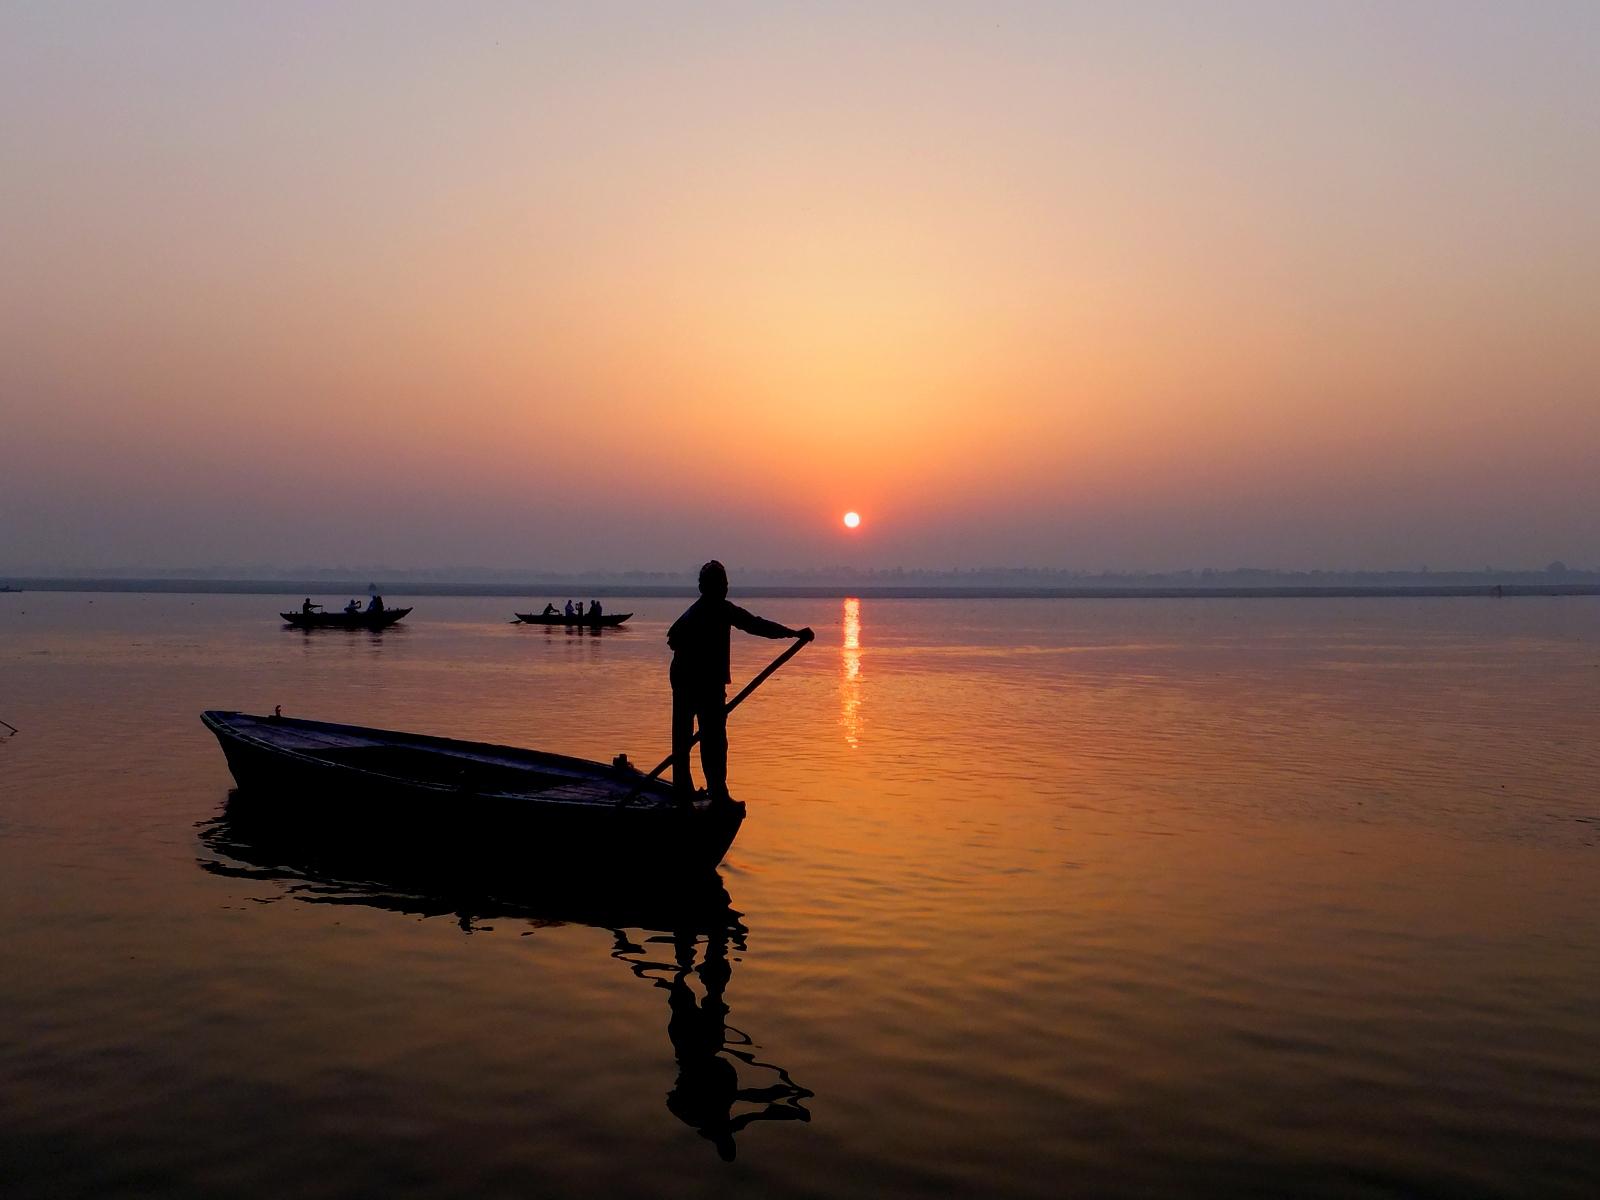 рассвет на Ганге, лодки на фоне встающего солнца